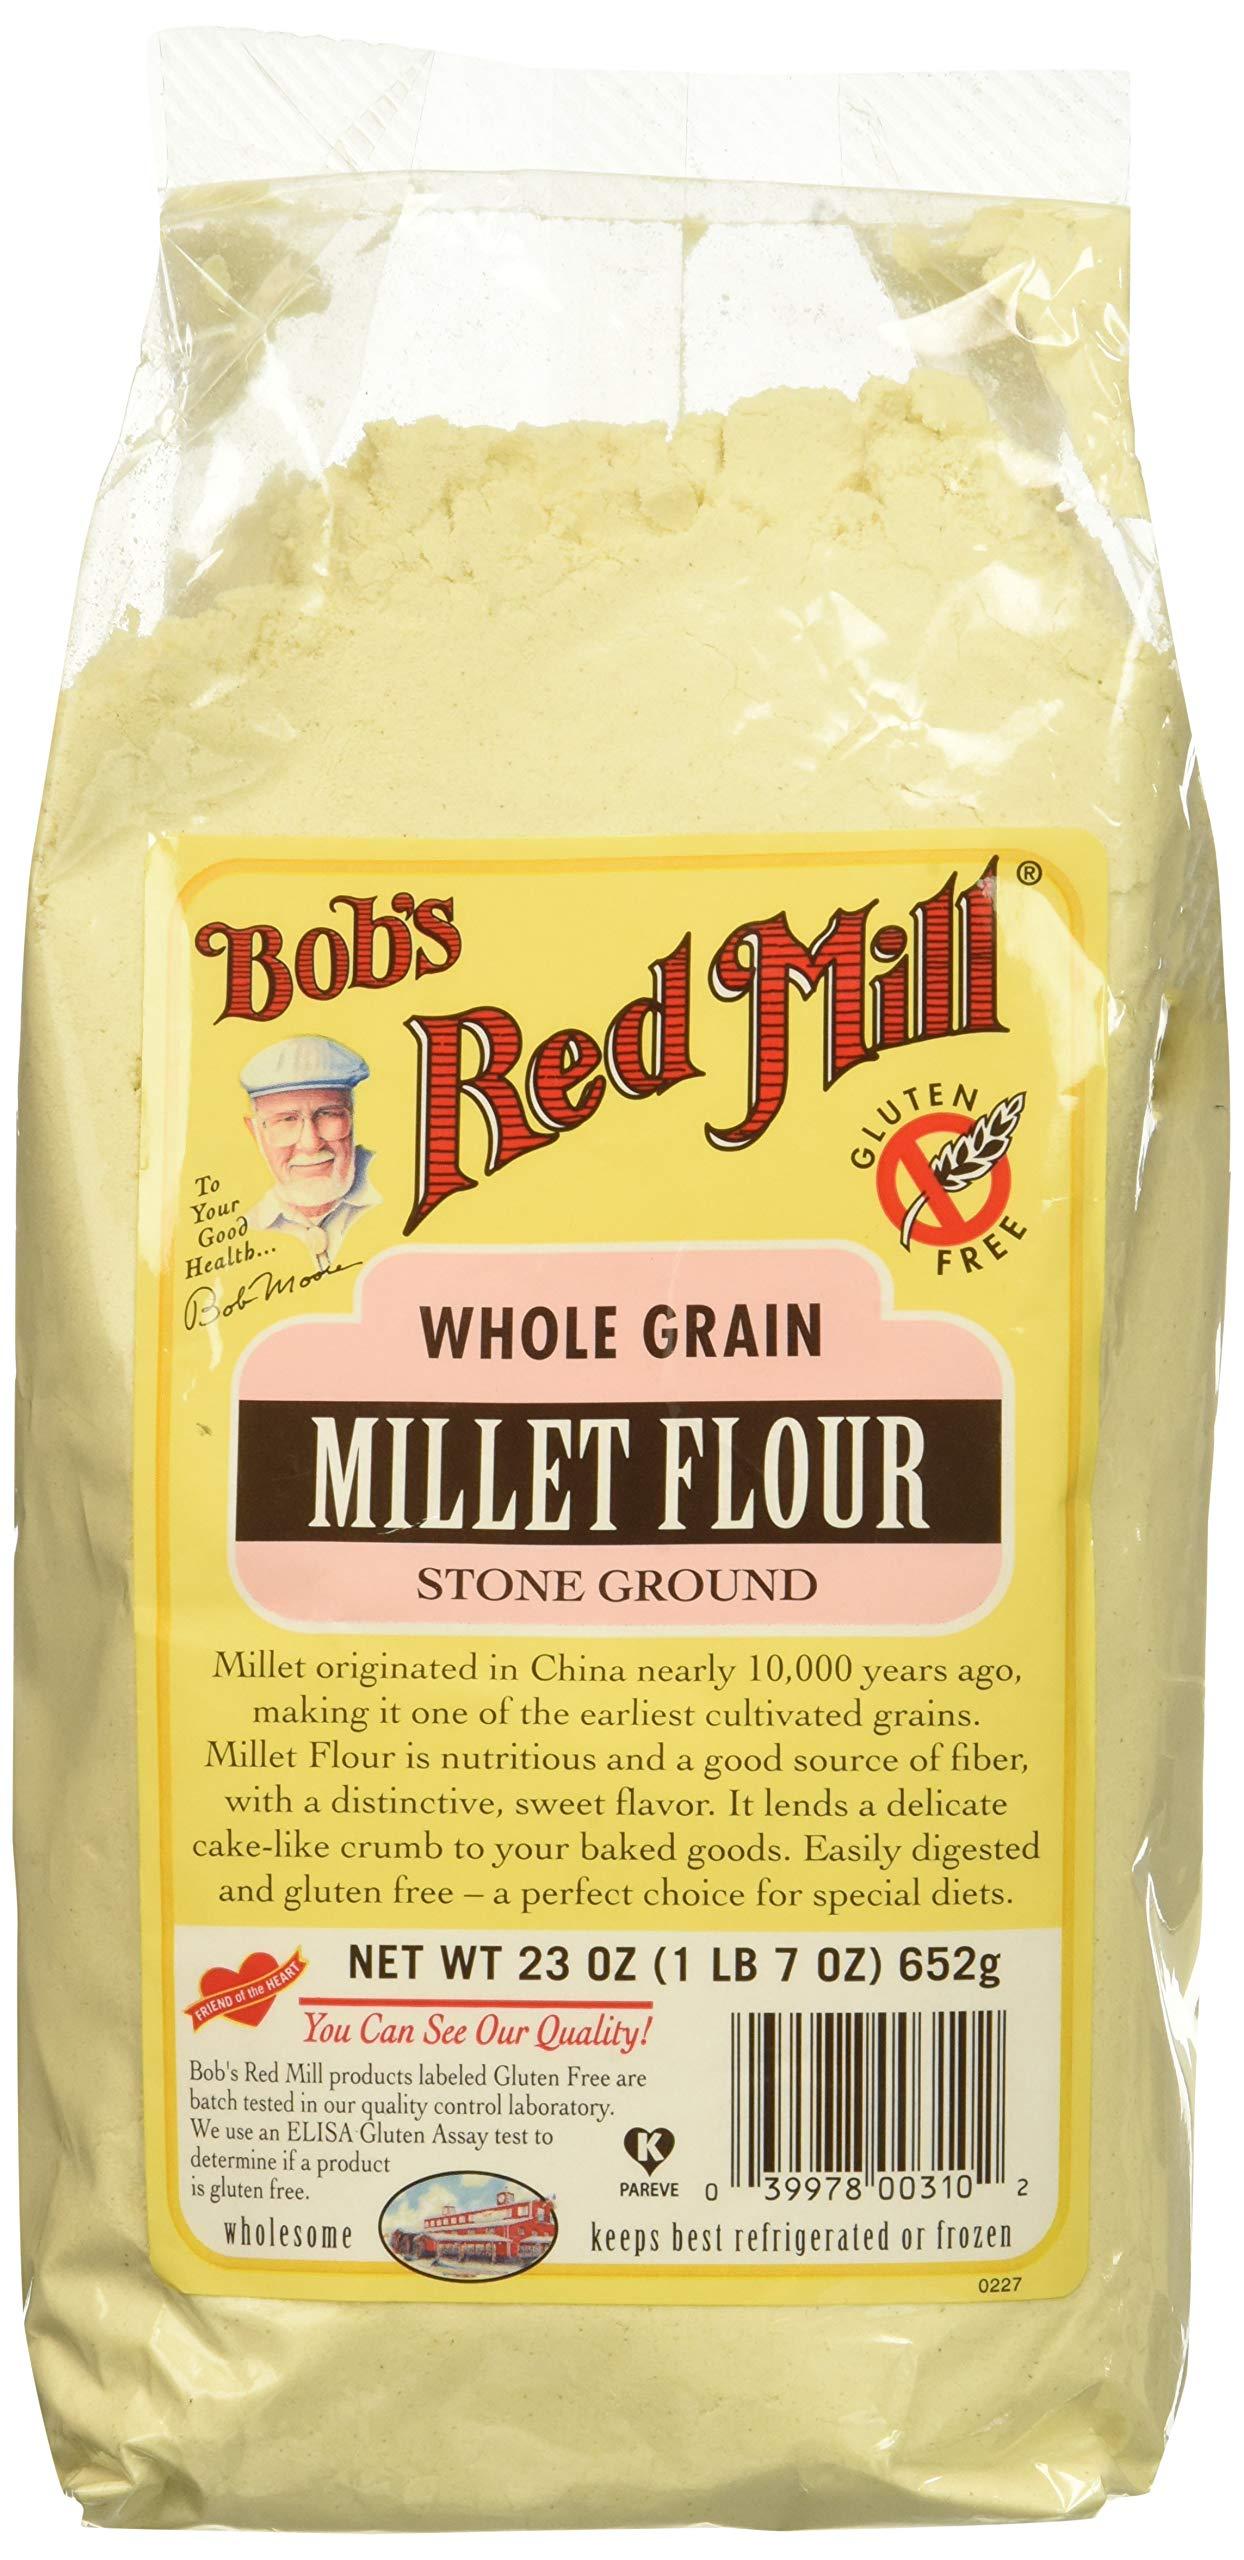 BOBS RED MILL FLOUR GF MILLET